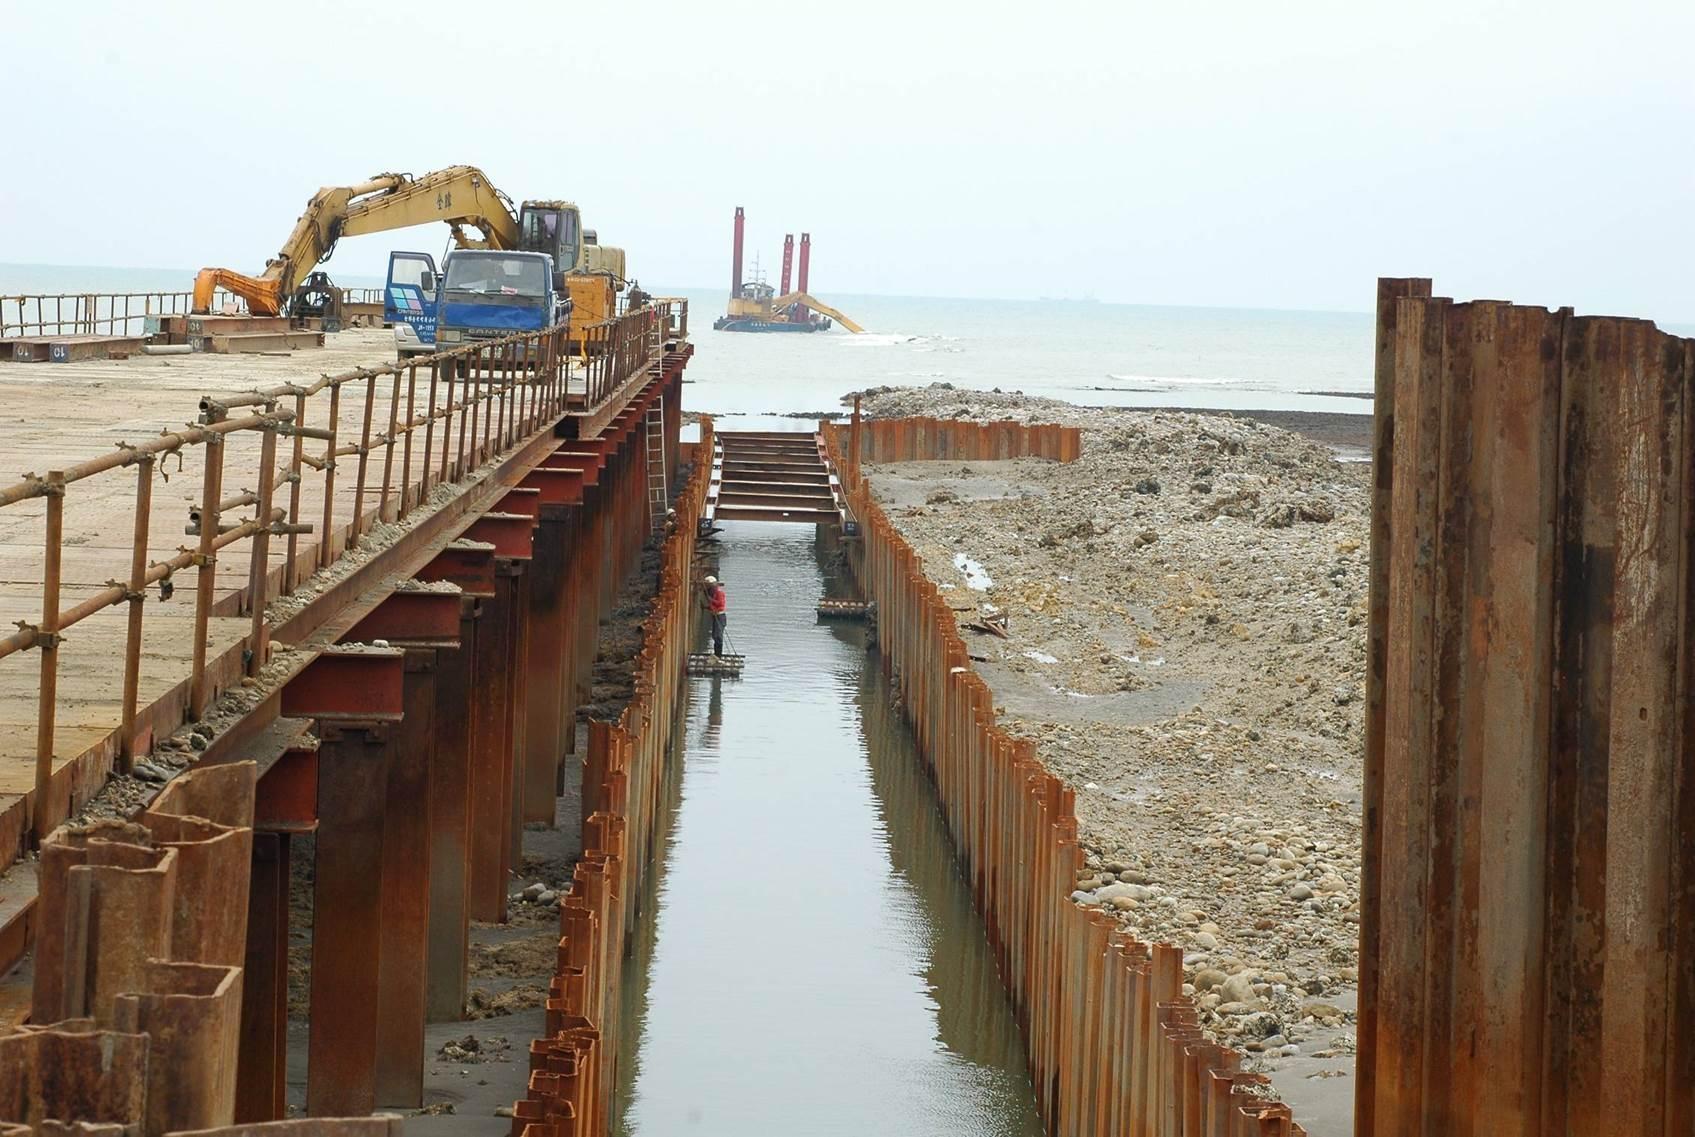 人為開發對藻礁造成可觀的破壞。Photograph courtesy of Mission Blue